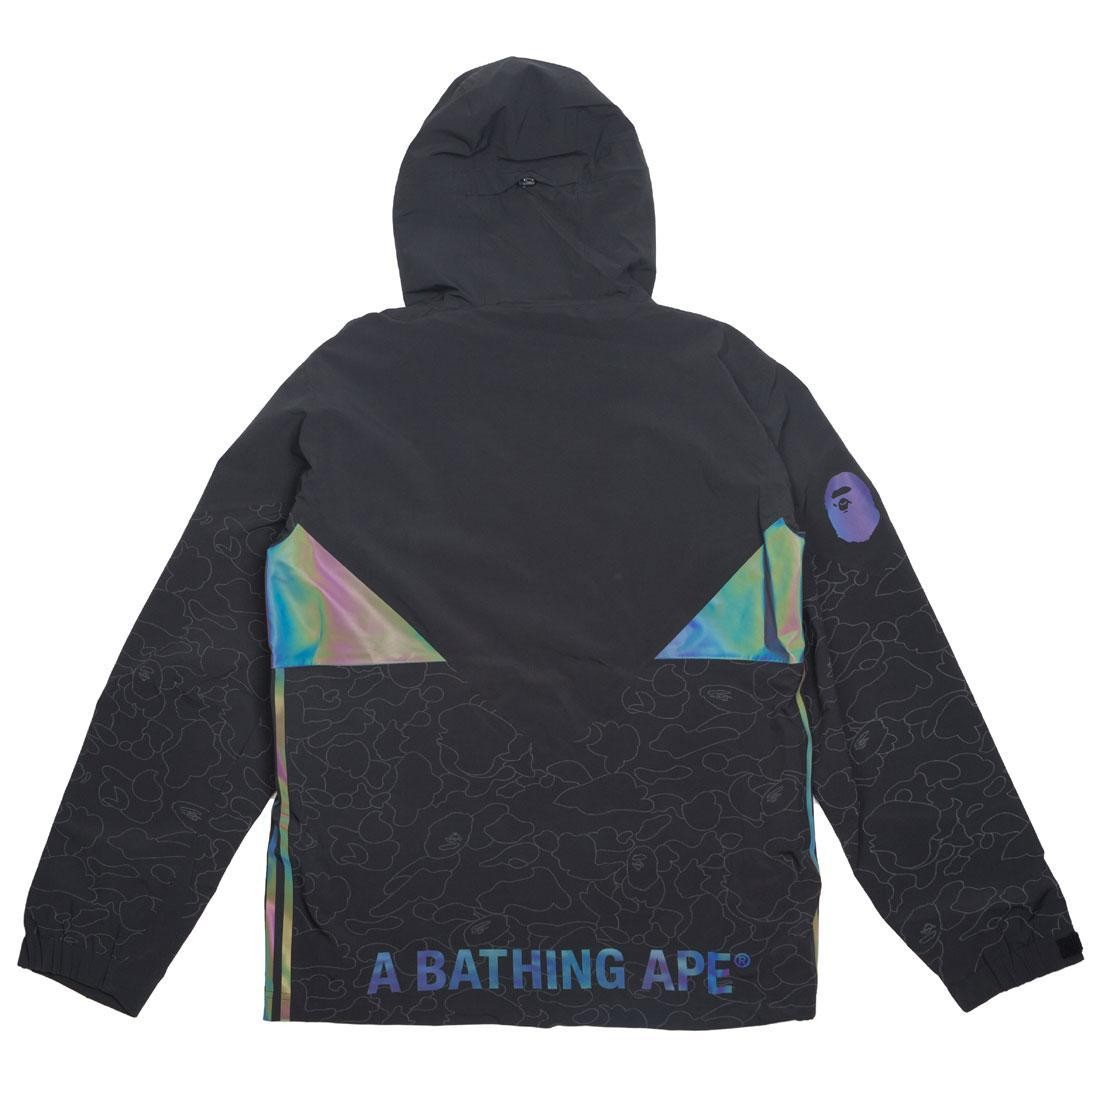 b0954178fdd4 ... Adidas x BAPE Men Snow Jacket (black) ...